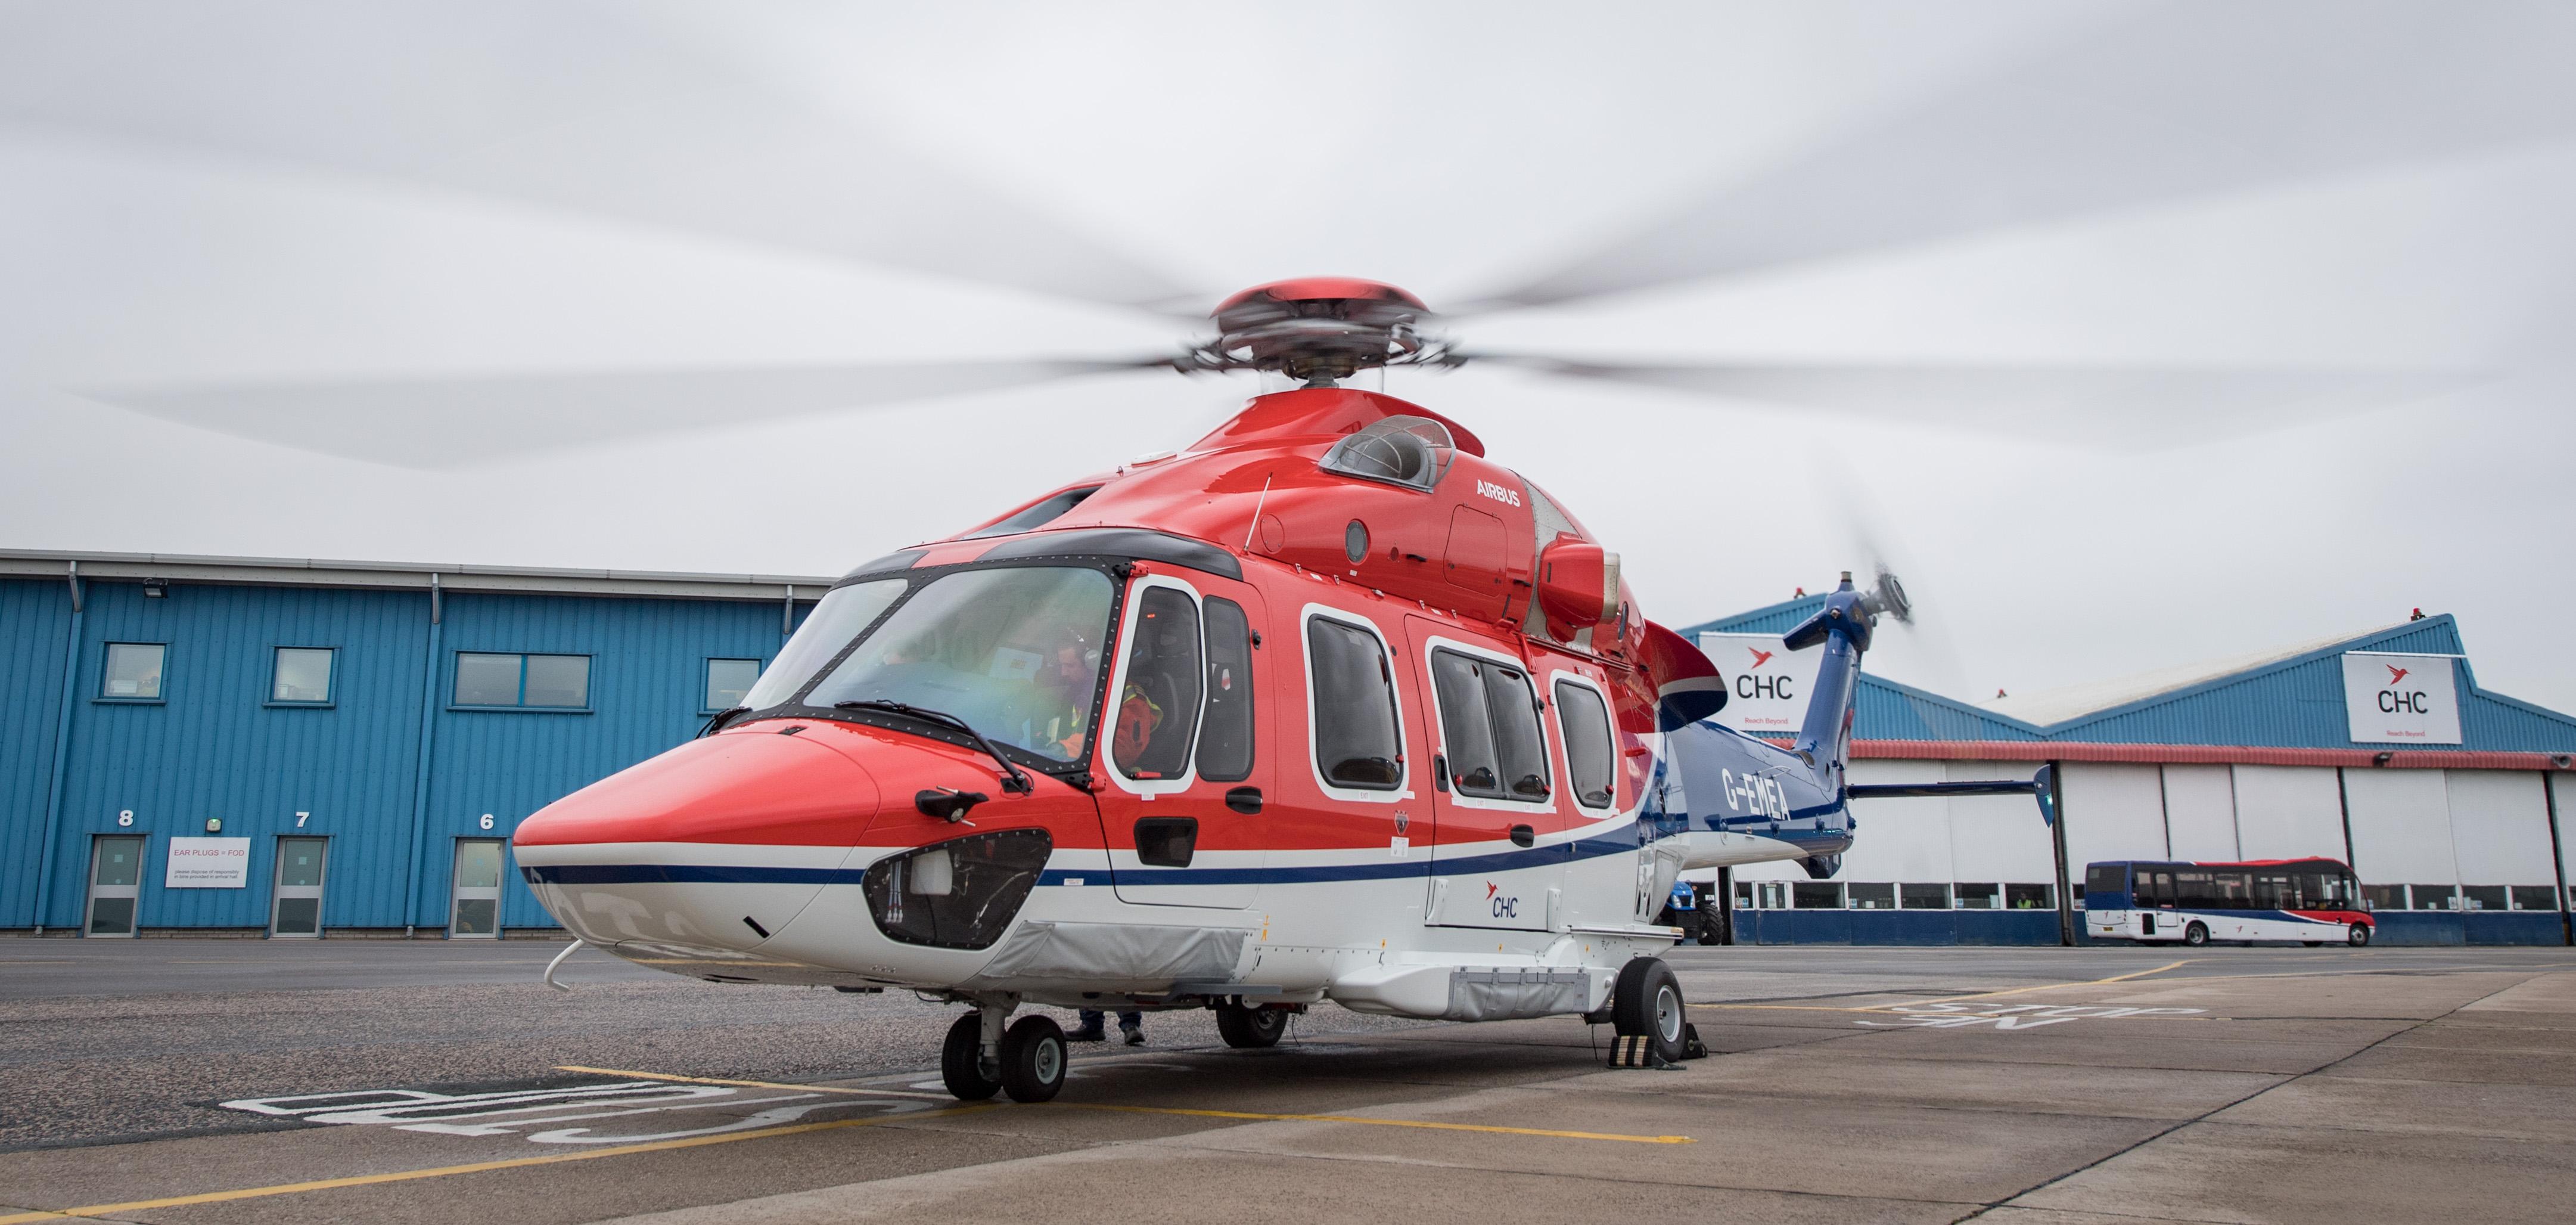 CHC Helicopter внедряет систему мониторинга авиапарка AW-139